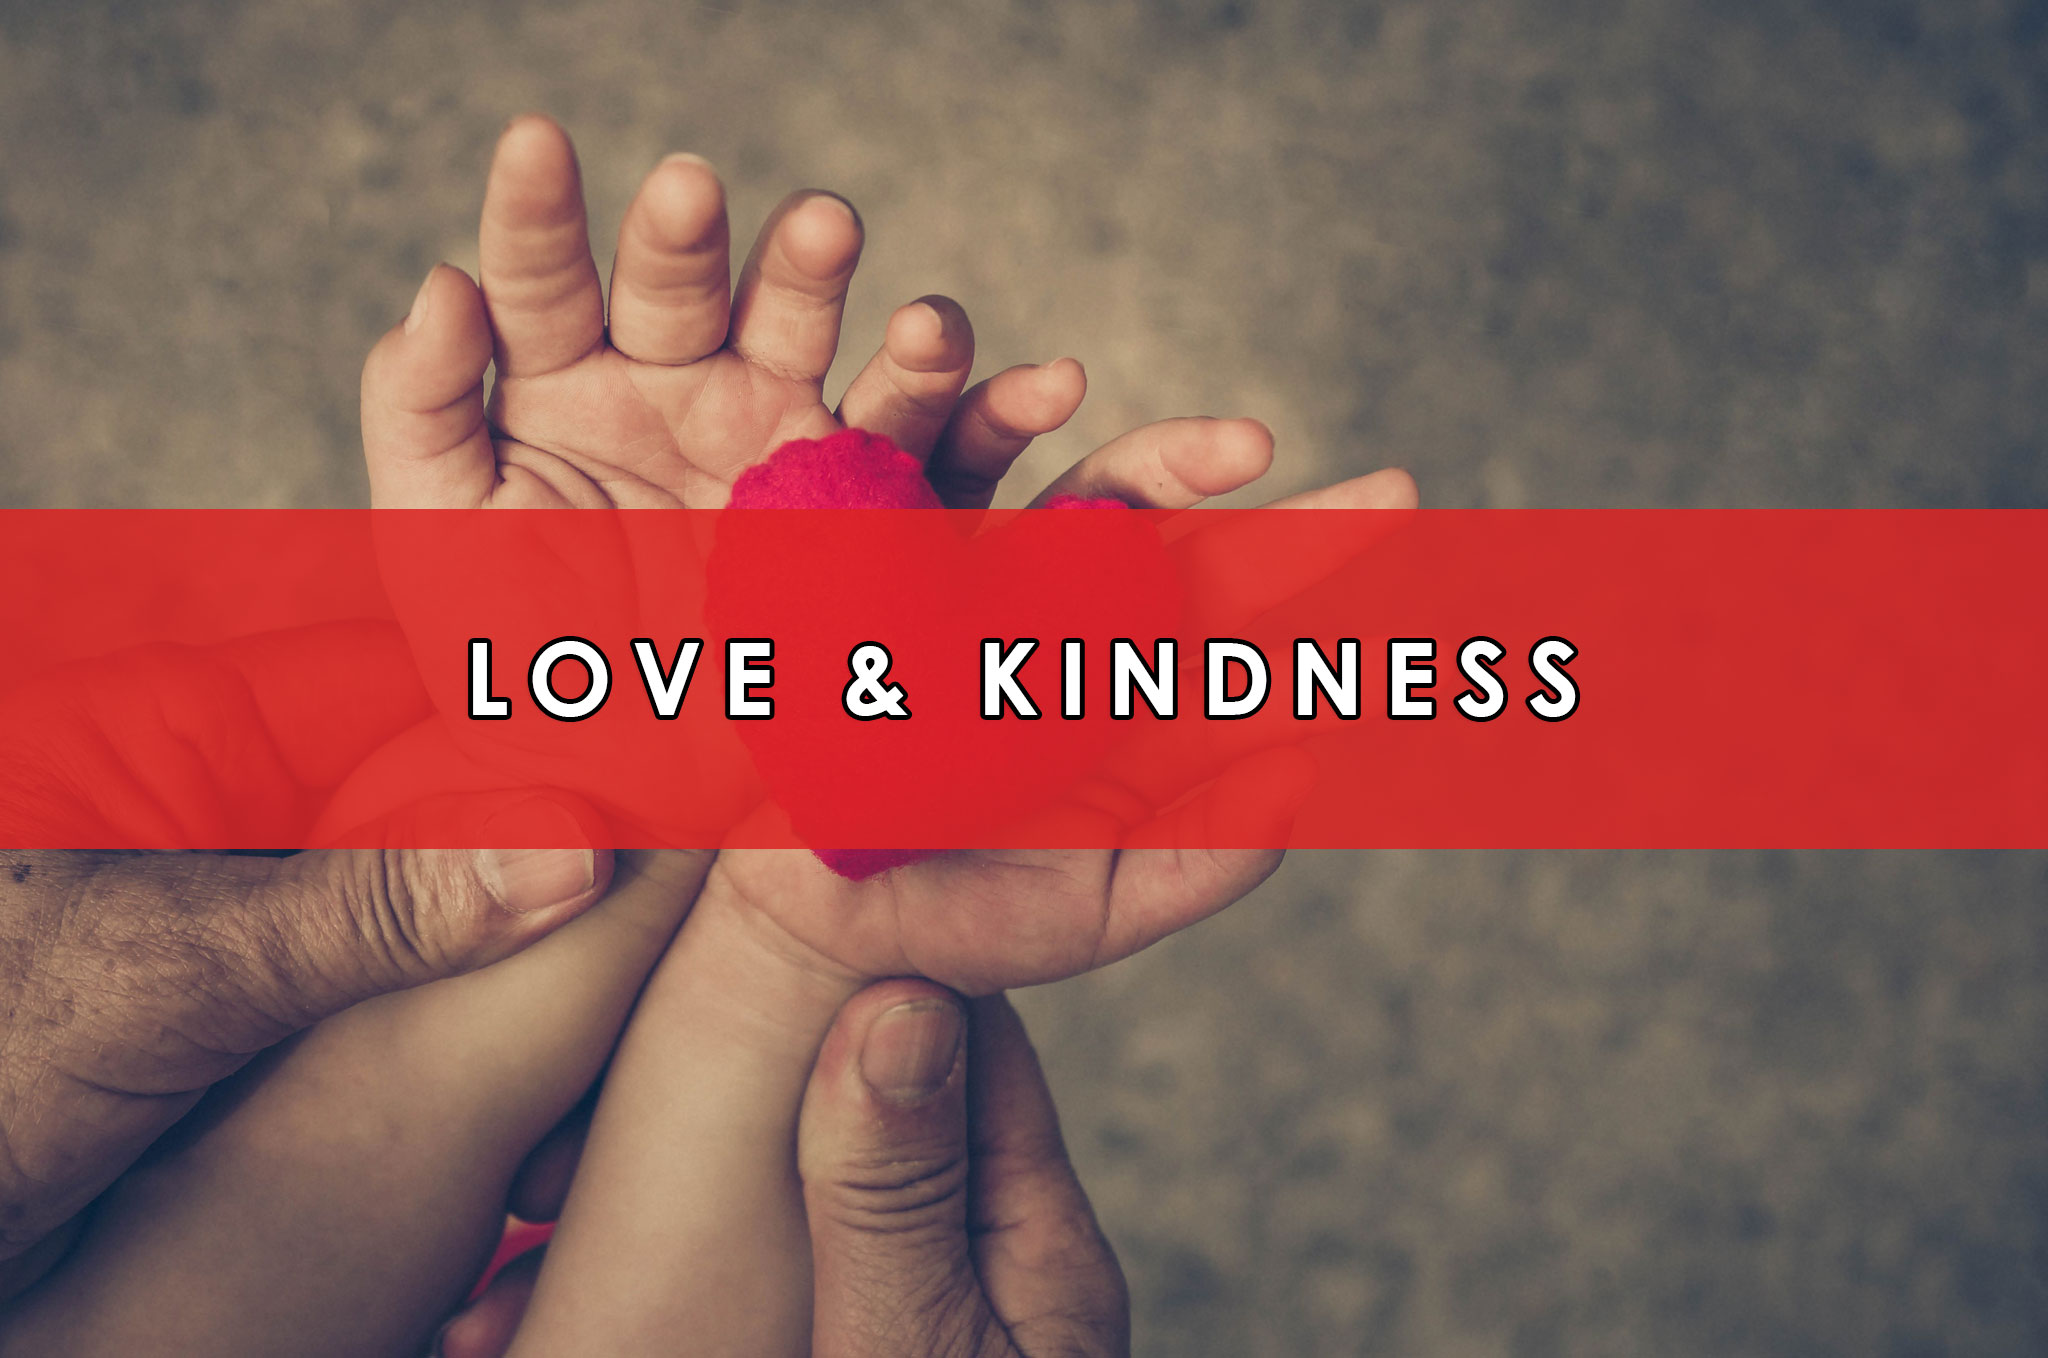 Love & Kindness | HeartFirst Education Core Value